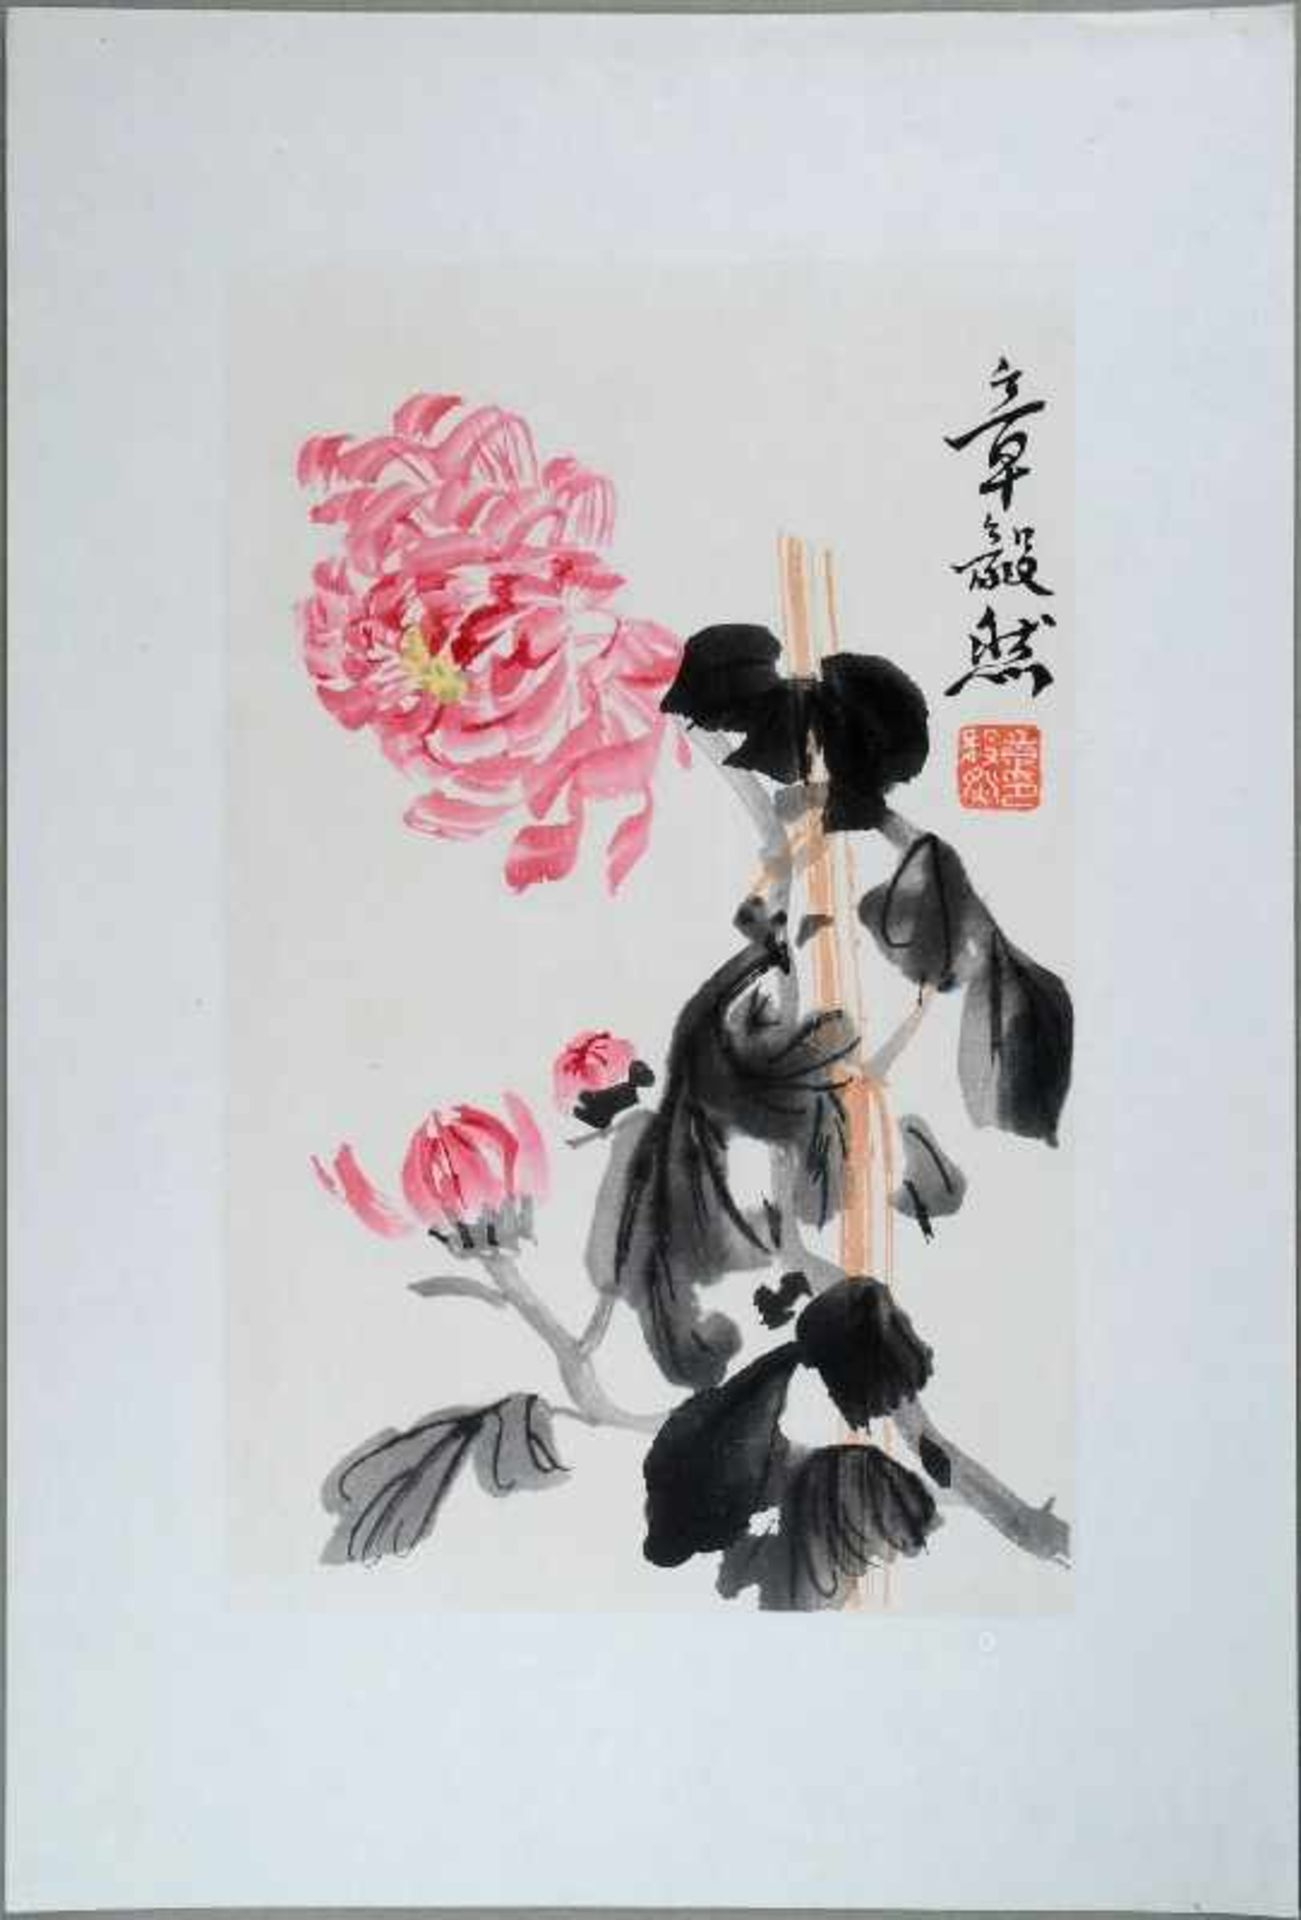 Zhan Yiran (20. Jh.) Aquarellfarben-Holzschnitt. China, Zhan Yiran (20. Jh.) Darstellung einer